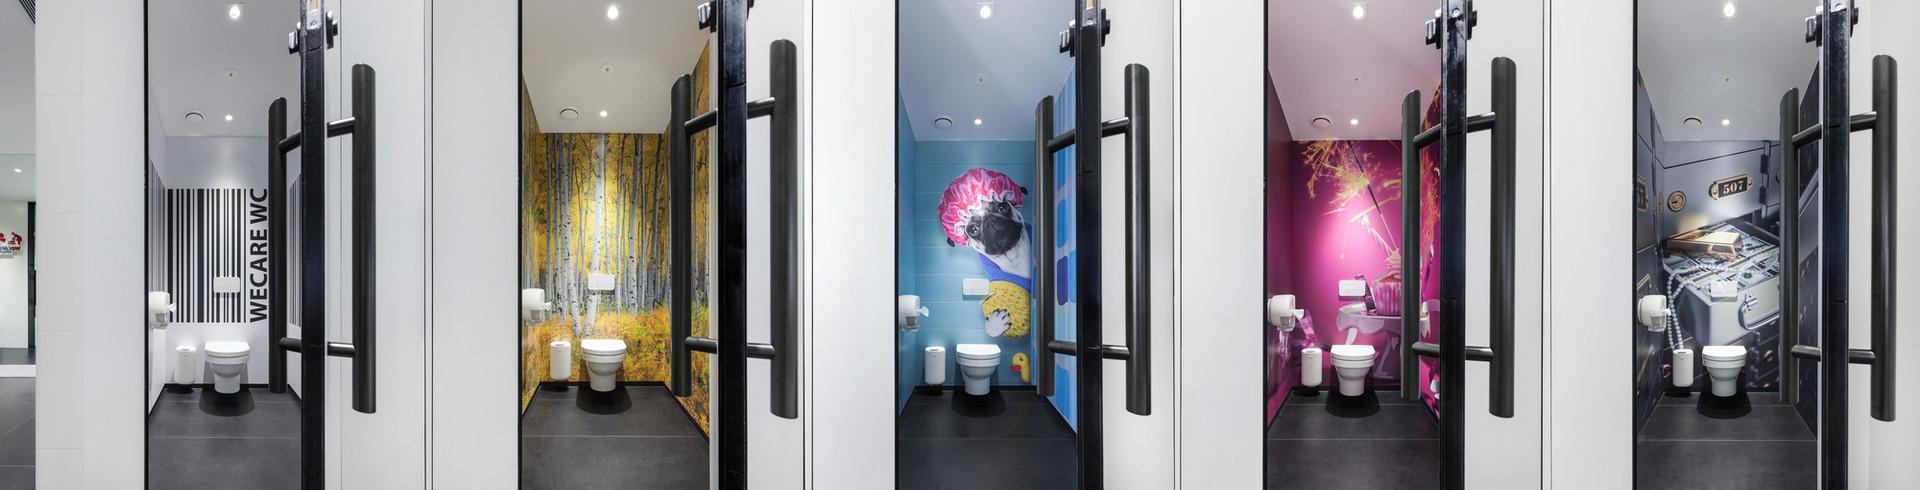 WeCare WC